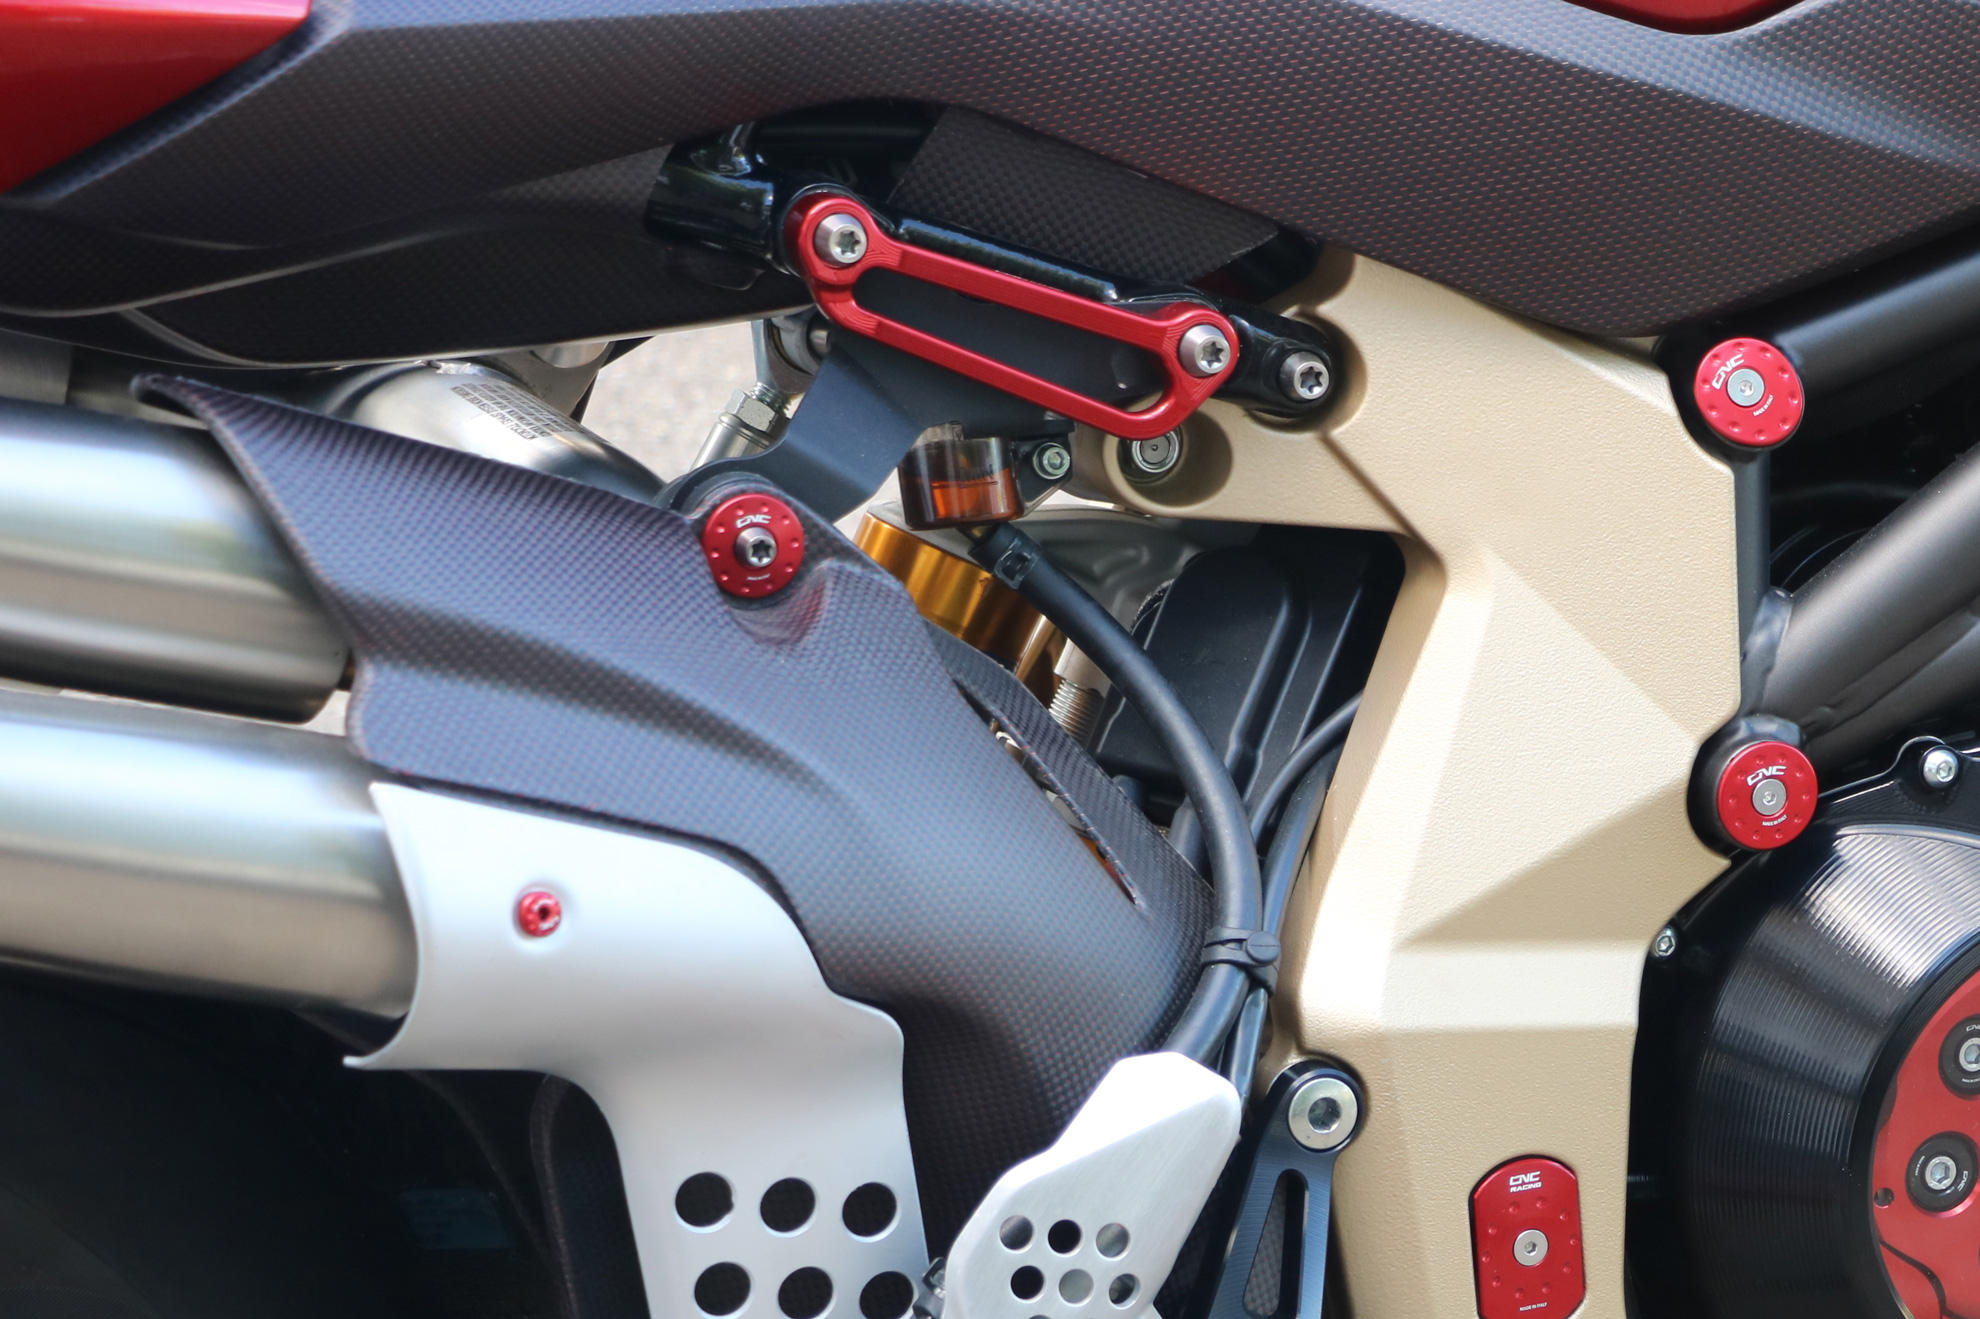 CNC Racing MV Agusta Brutale 1000 RR / Rush Rear Footrest Blanking Plates